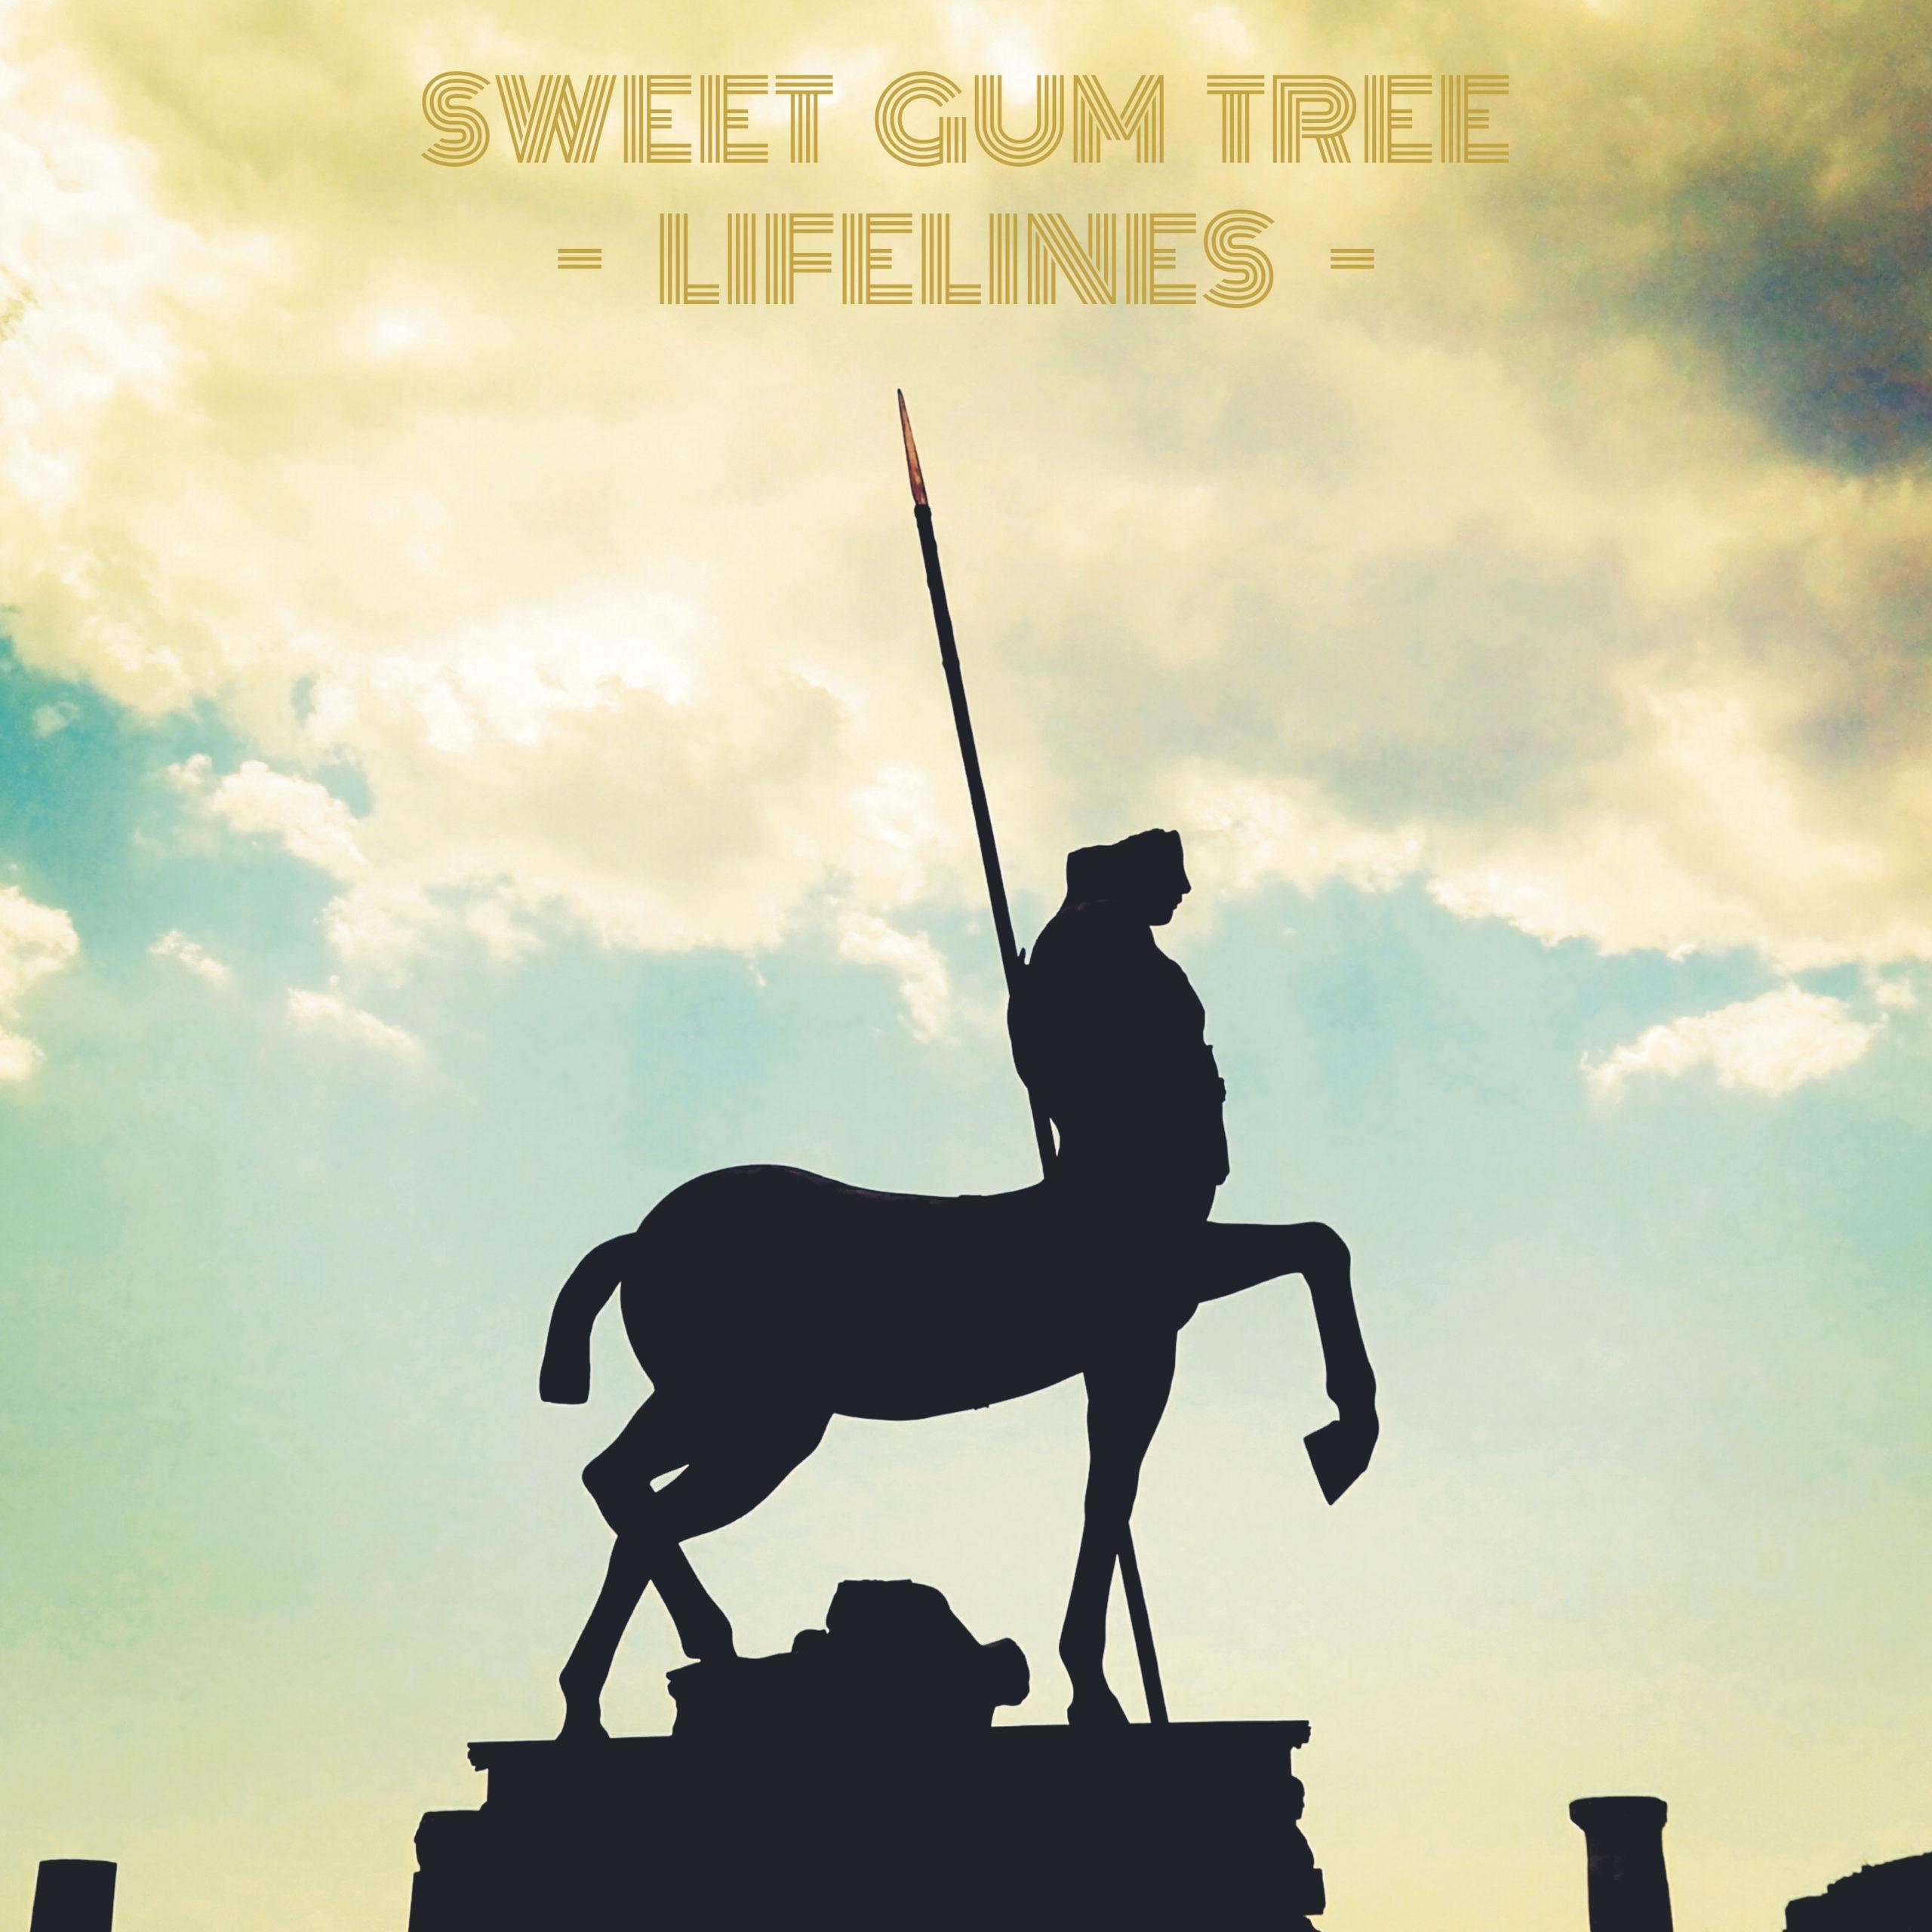 SWEET GUM TREE - Lifelines